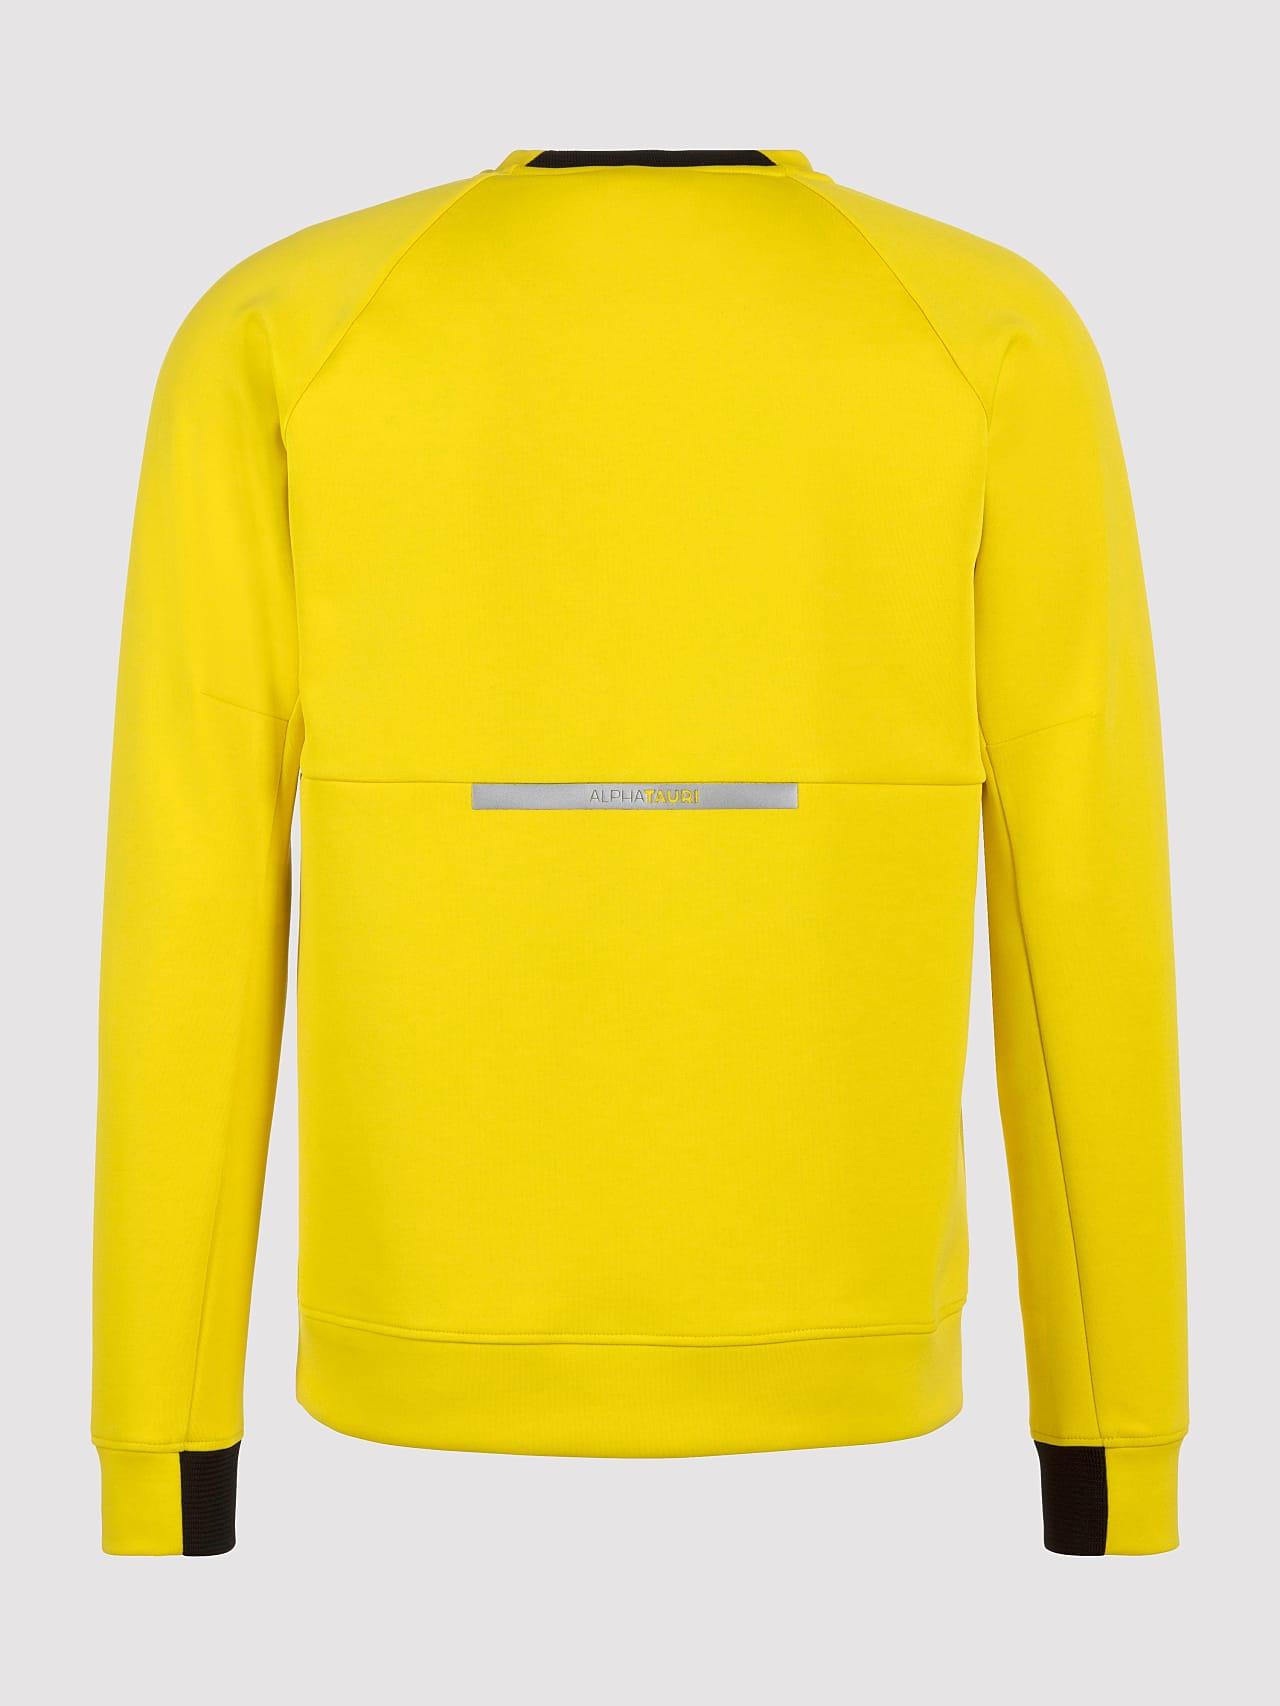 SUPRA V3.Y5.01 Technical Crewneck Sweater yellow Left Alpha Tauri